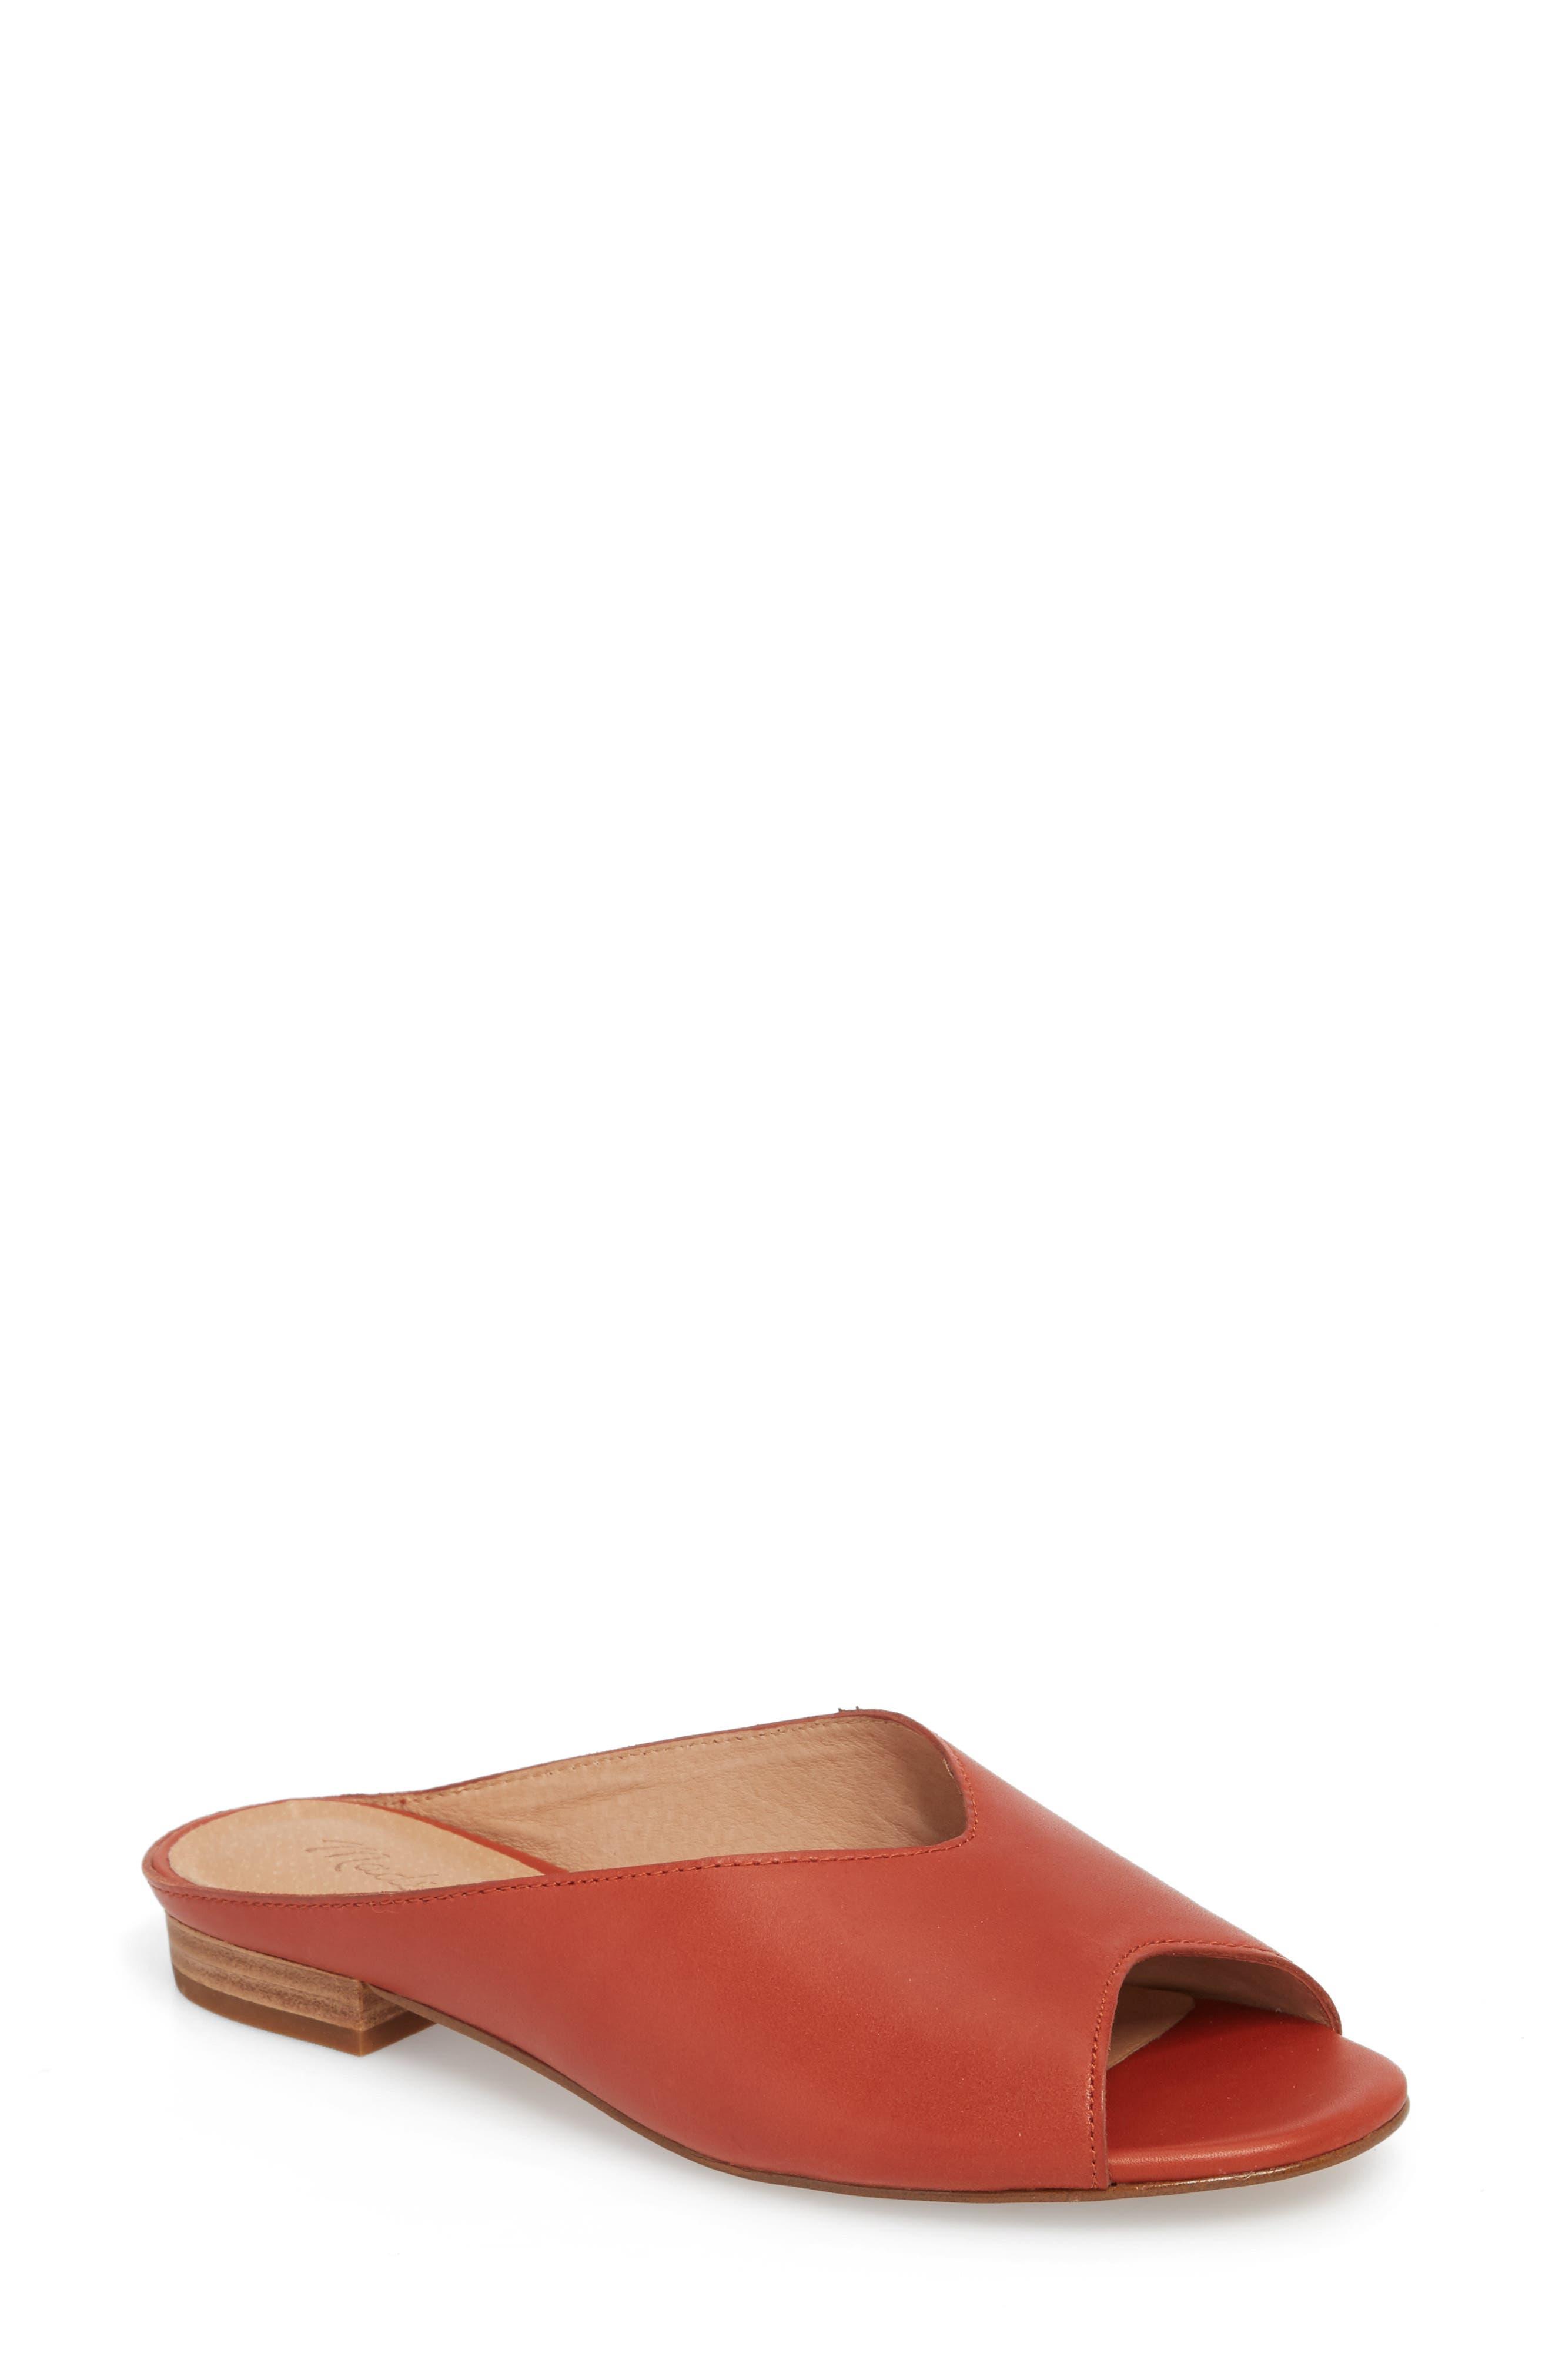 Tavi Slide Sandal,                             Main thumbnail 1, color,                             Dark Cinnabar Leather